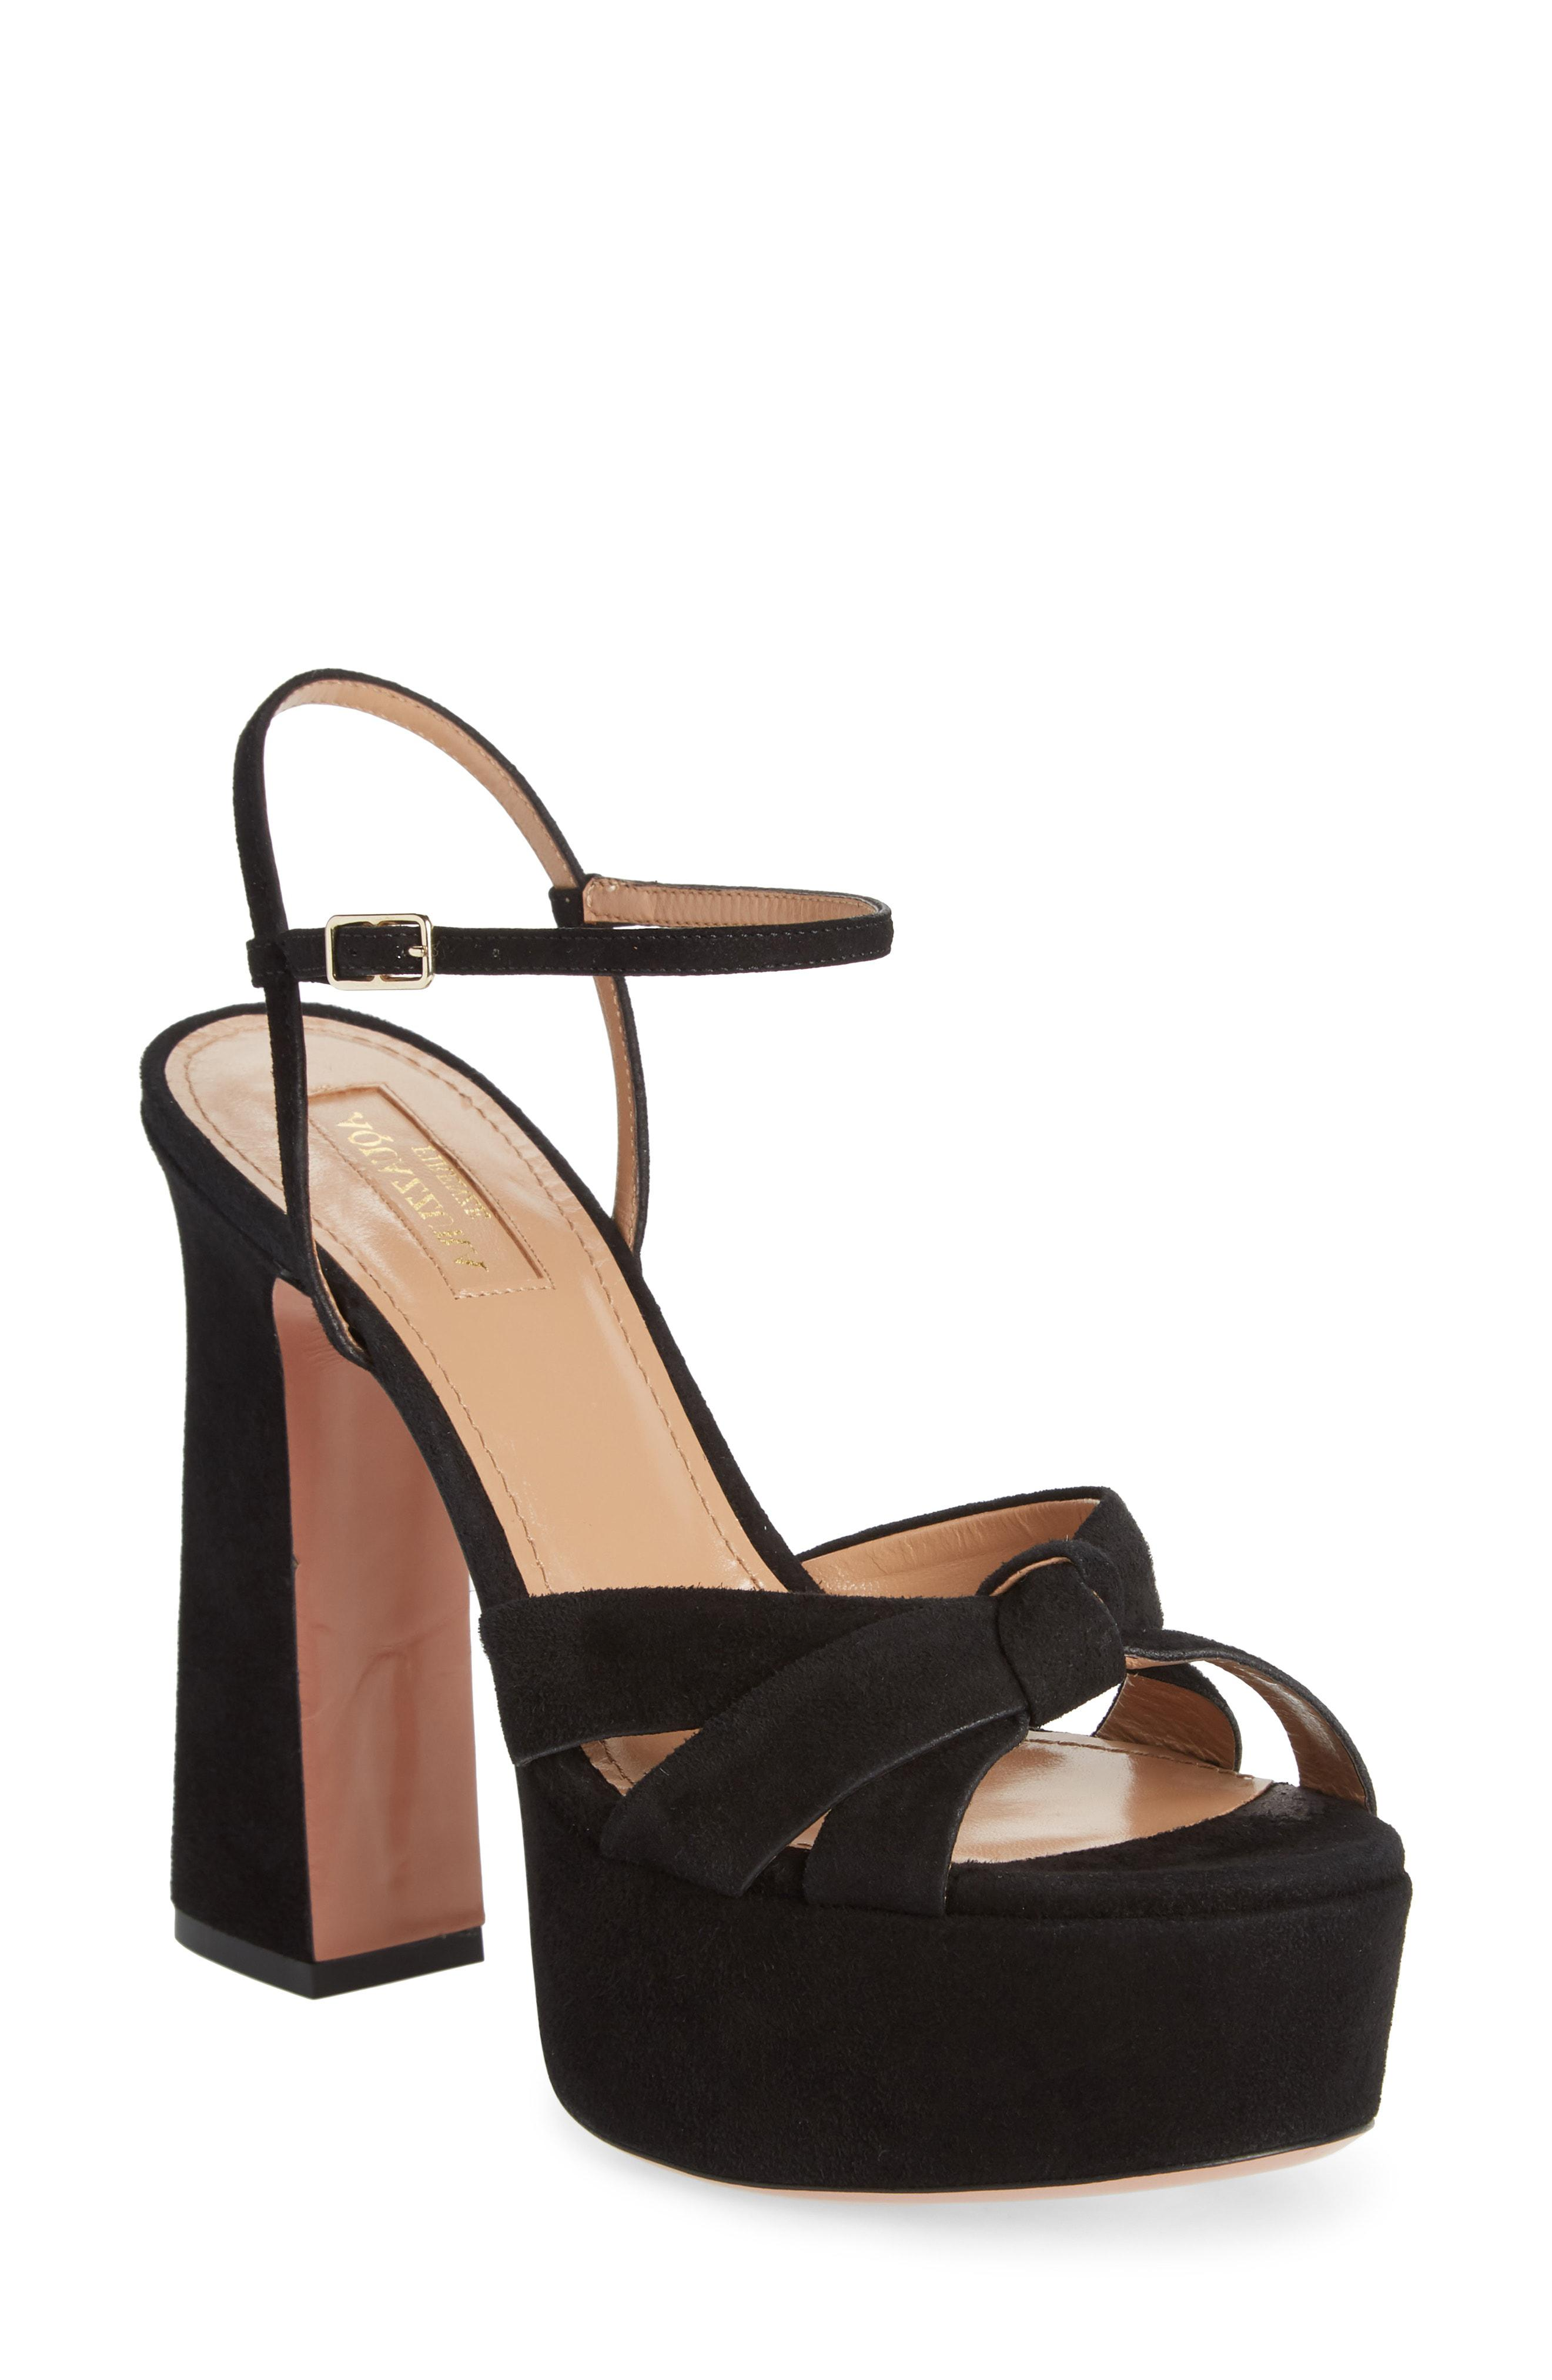 d7a6551a48f Lyst - Aquazzura Baba Platform Sandal in Black - Save 50%